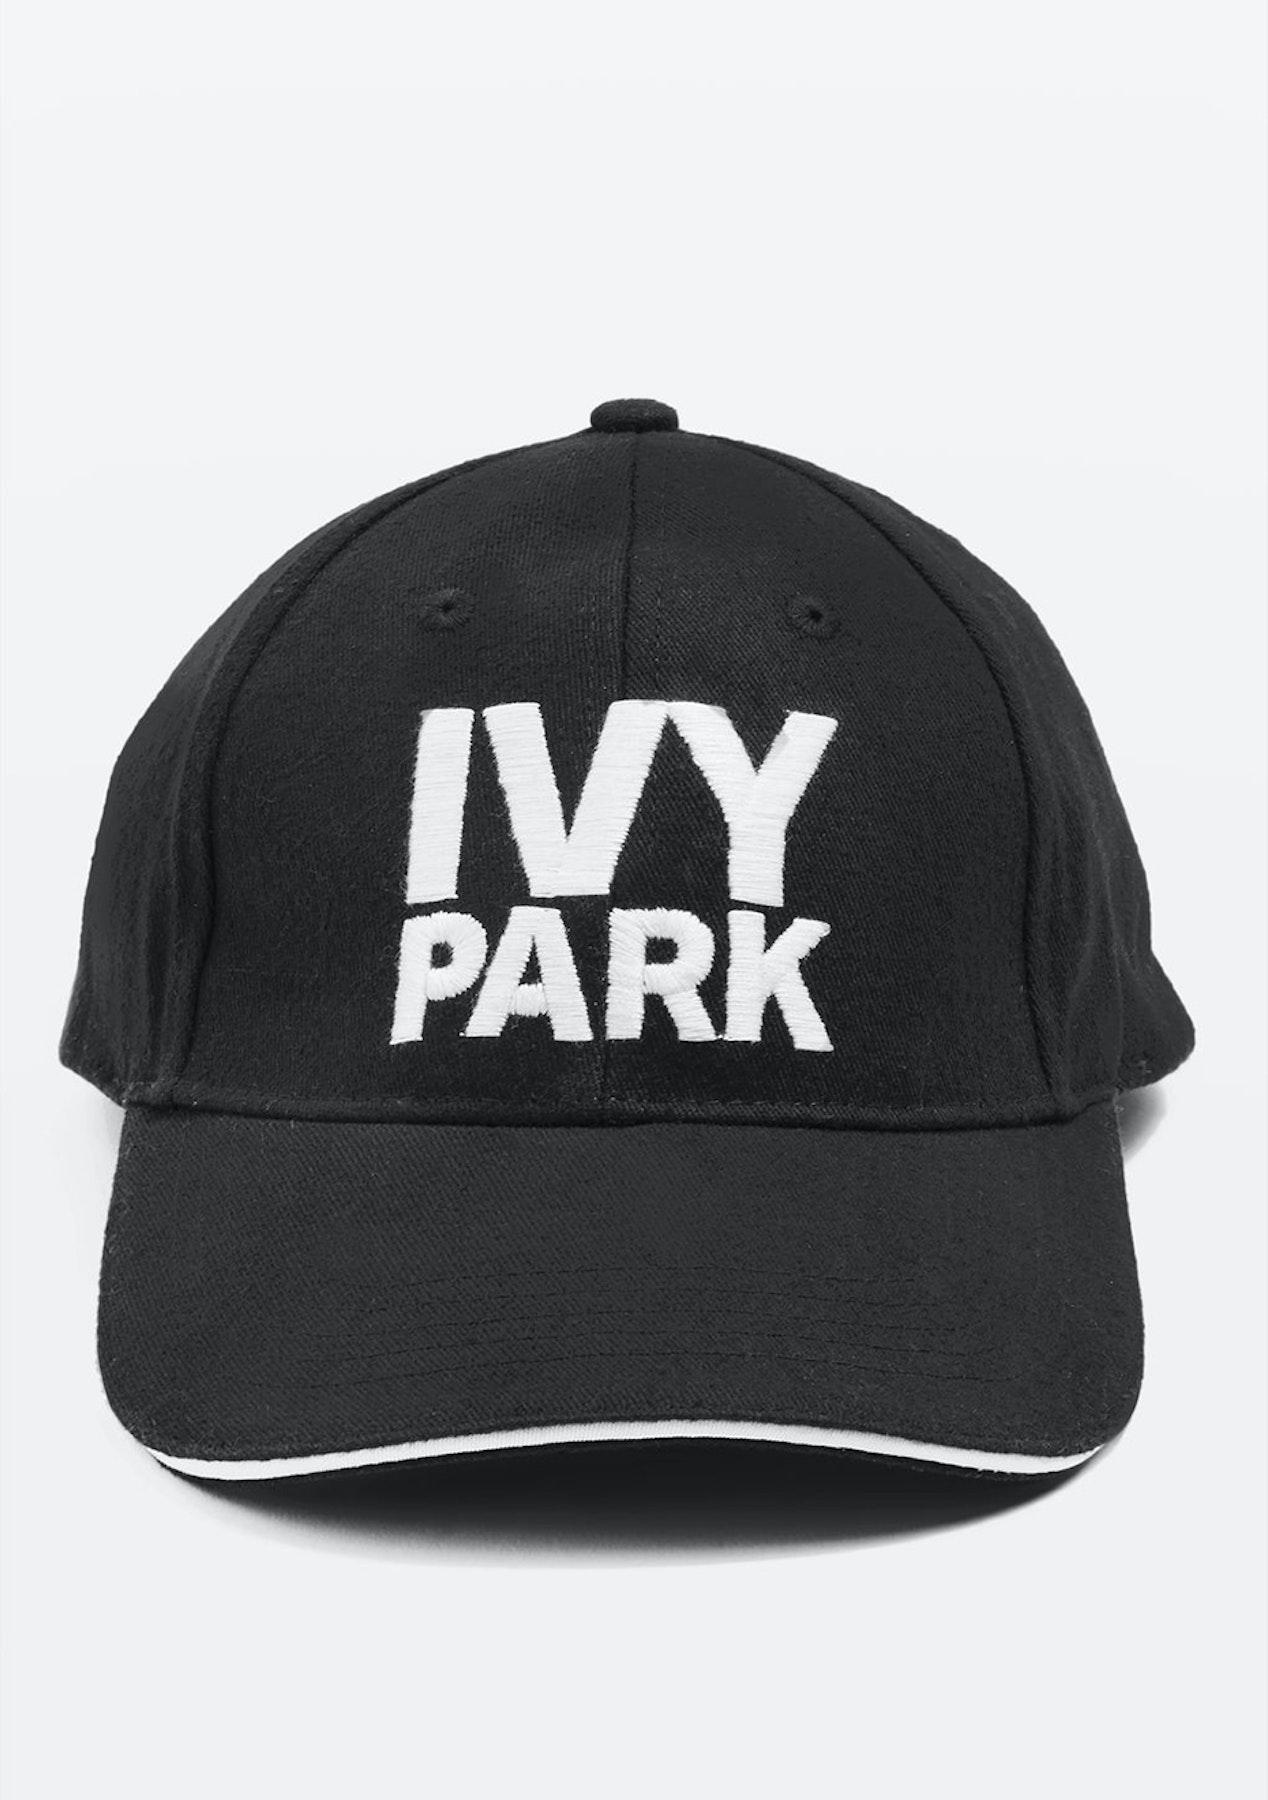 fa67a61e992 Ivy Park - Logo Baseball Cap - Black - Big Brand Activewear Sale - Onceit